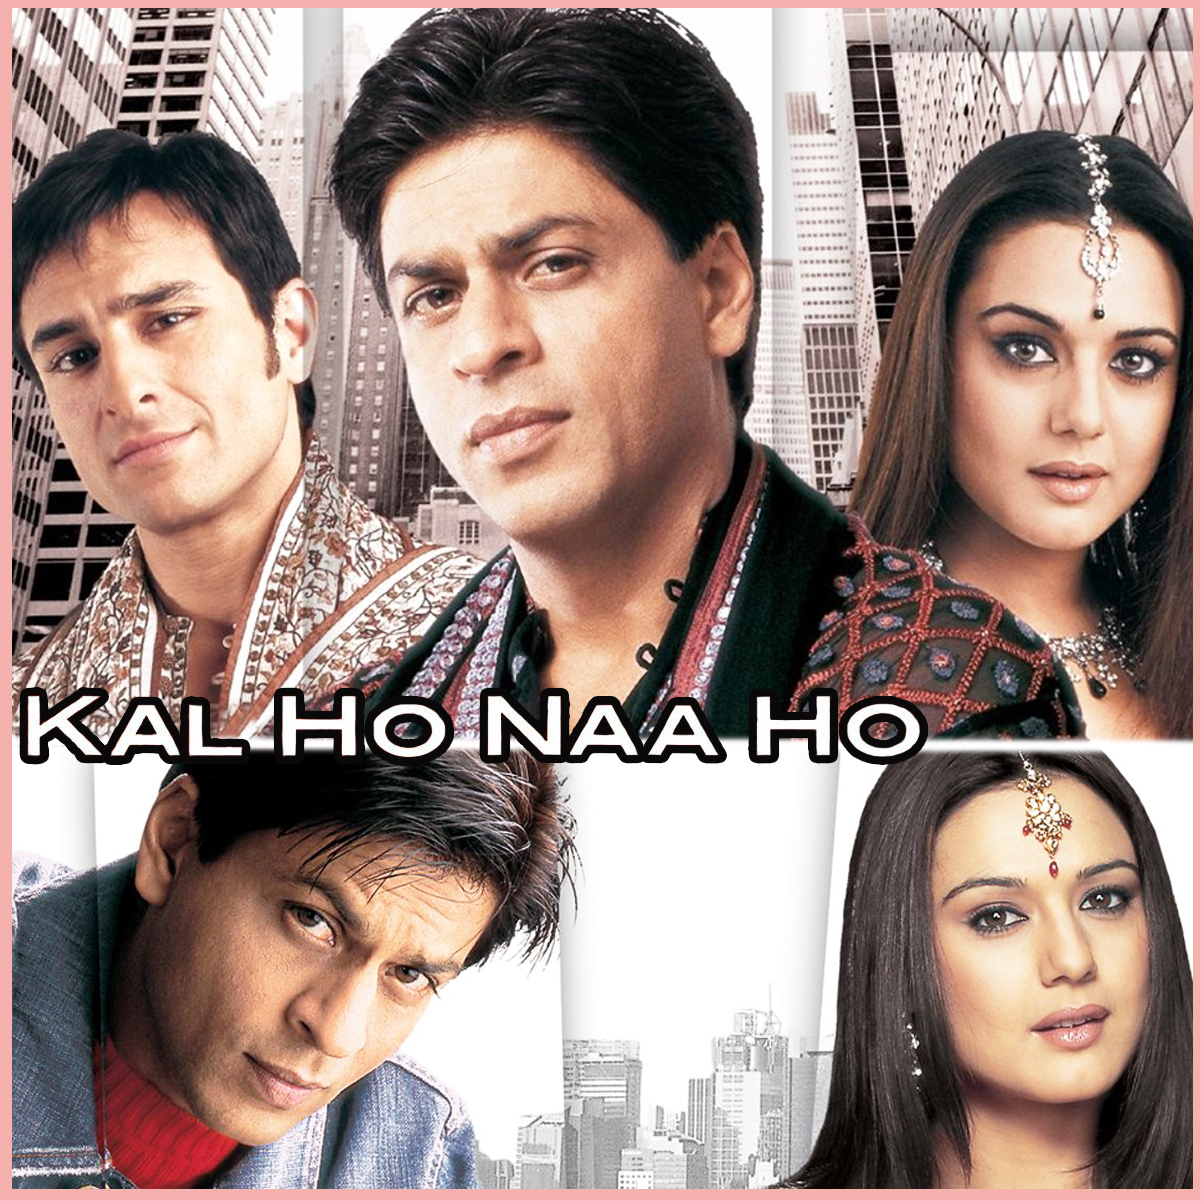 Kal ho na ho | Sonu Nigam | Download Hindi Karaoke MP3